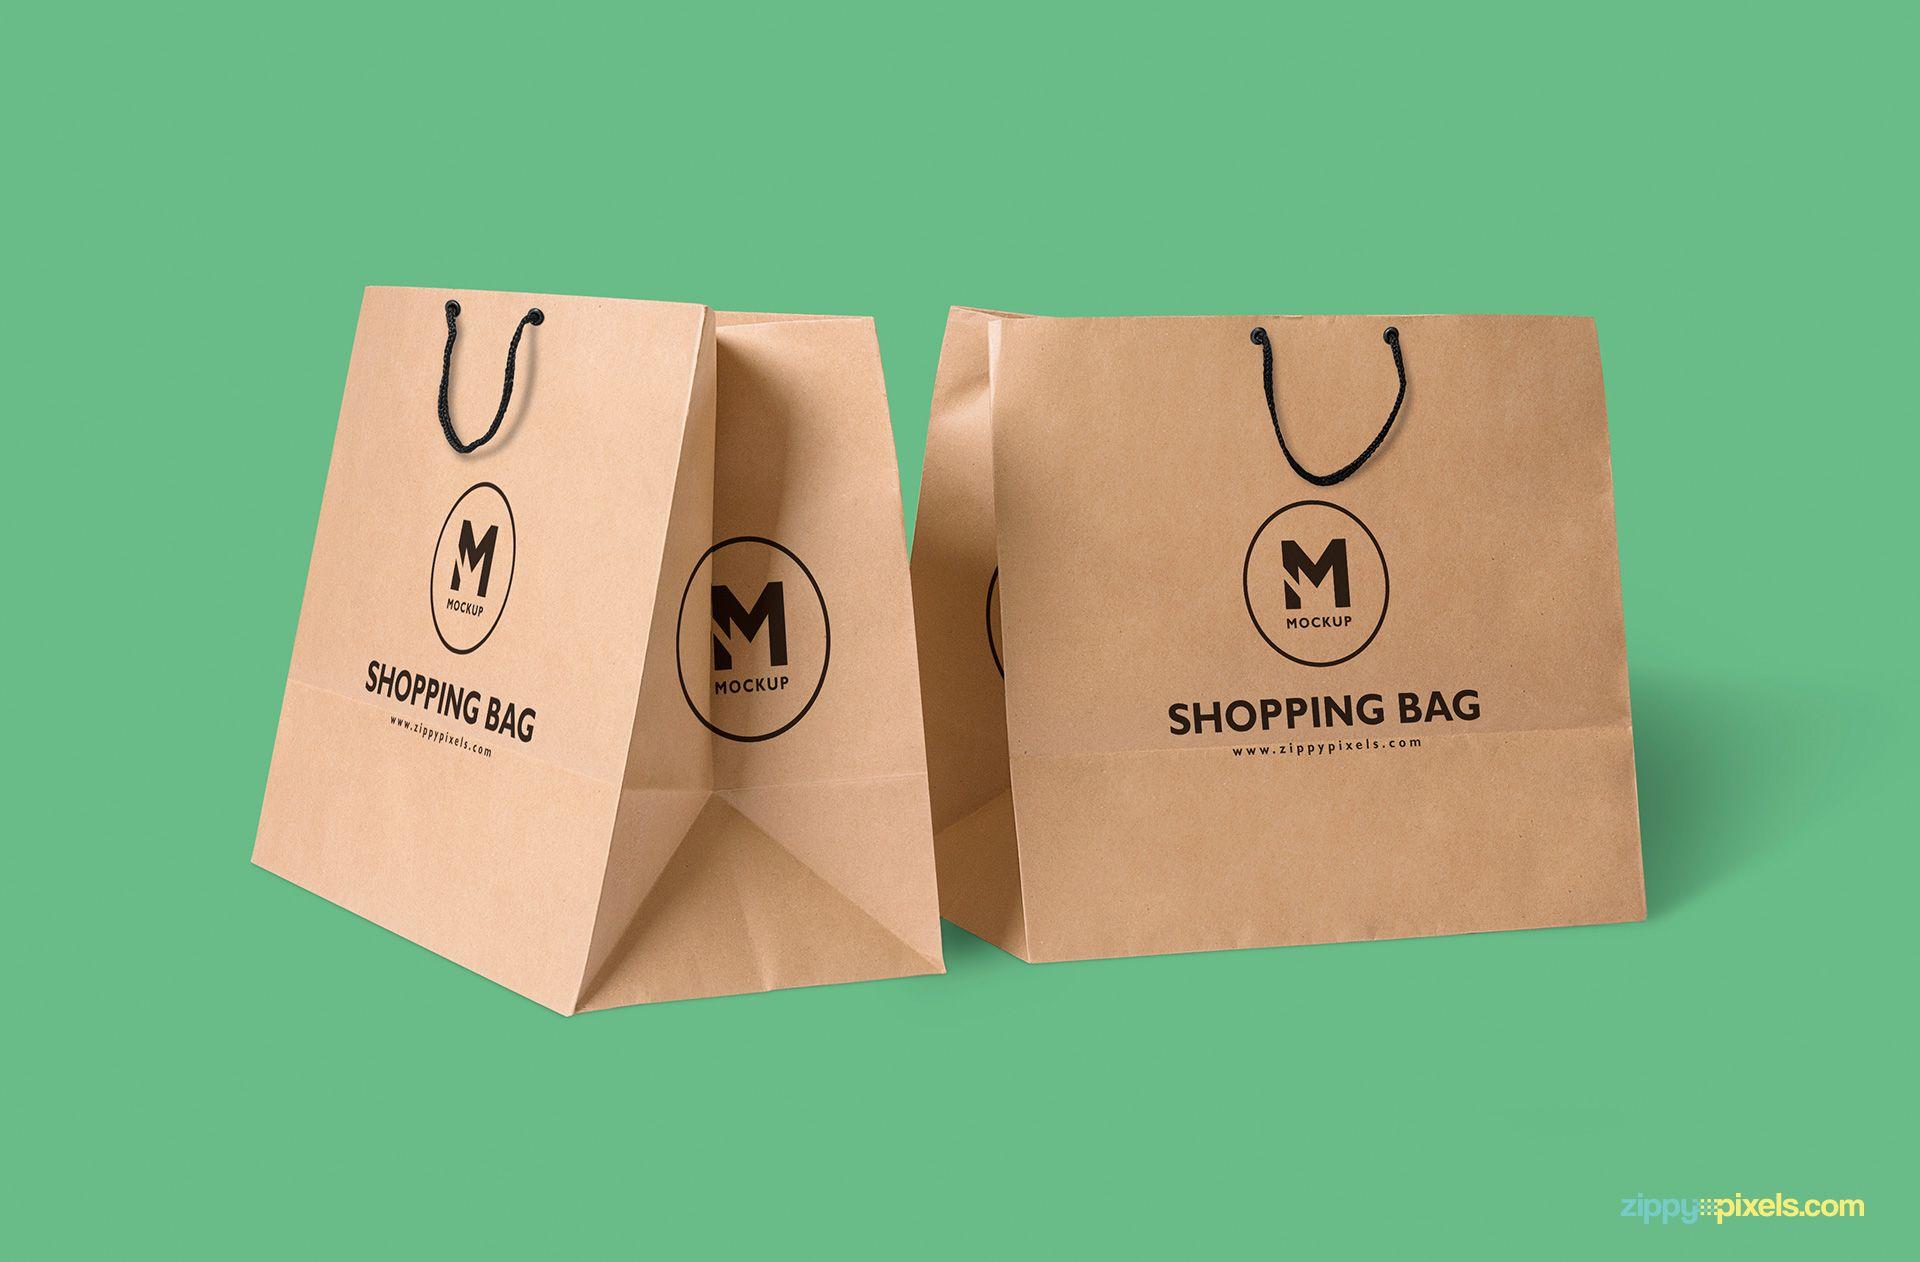 Download Paper Bag Mockup Free Psd Download Zippypixels Bag Mockup Print On Paper Bags Free Packaging Mockup